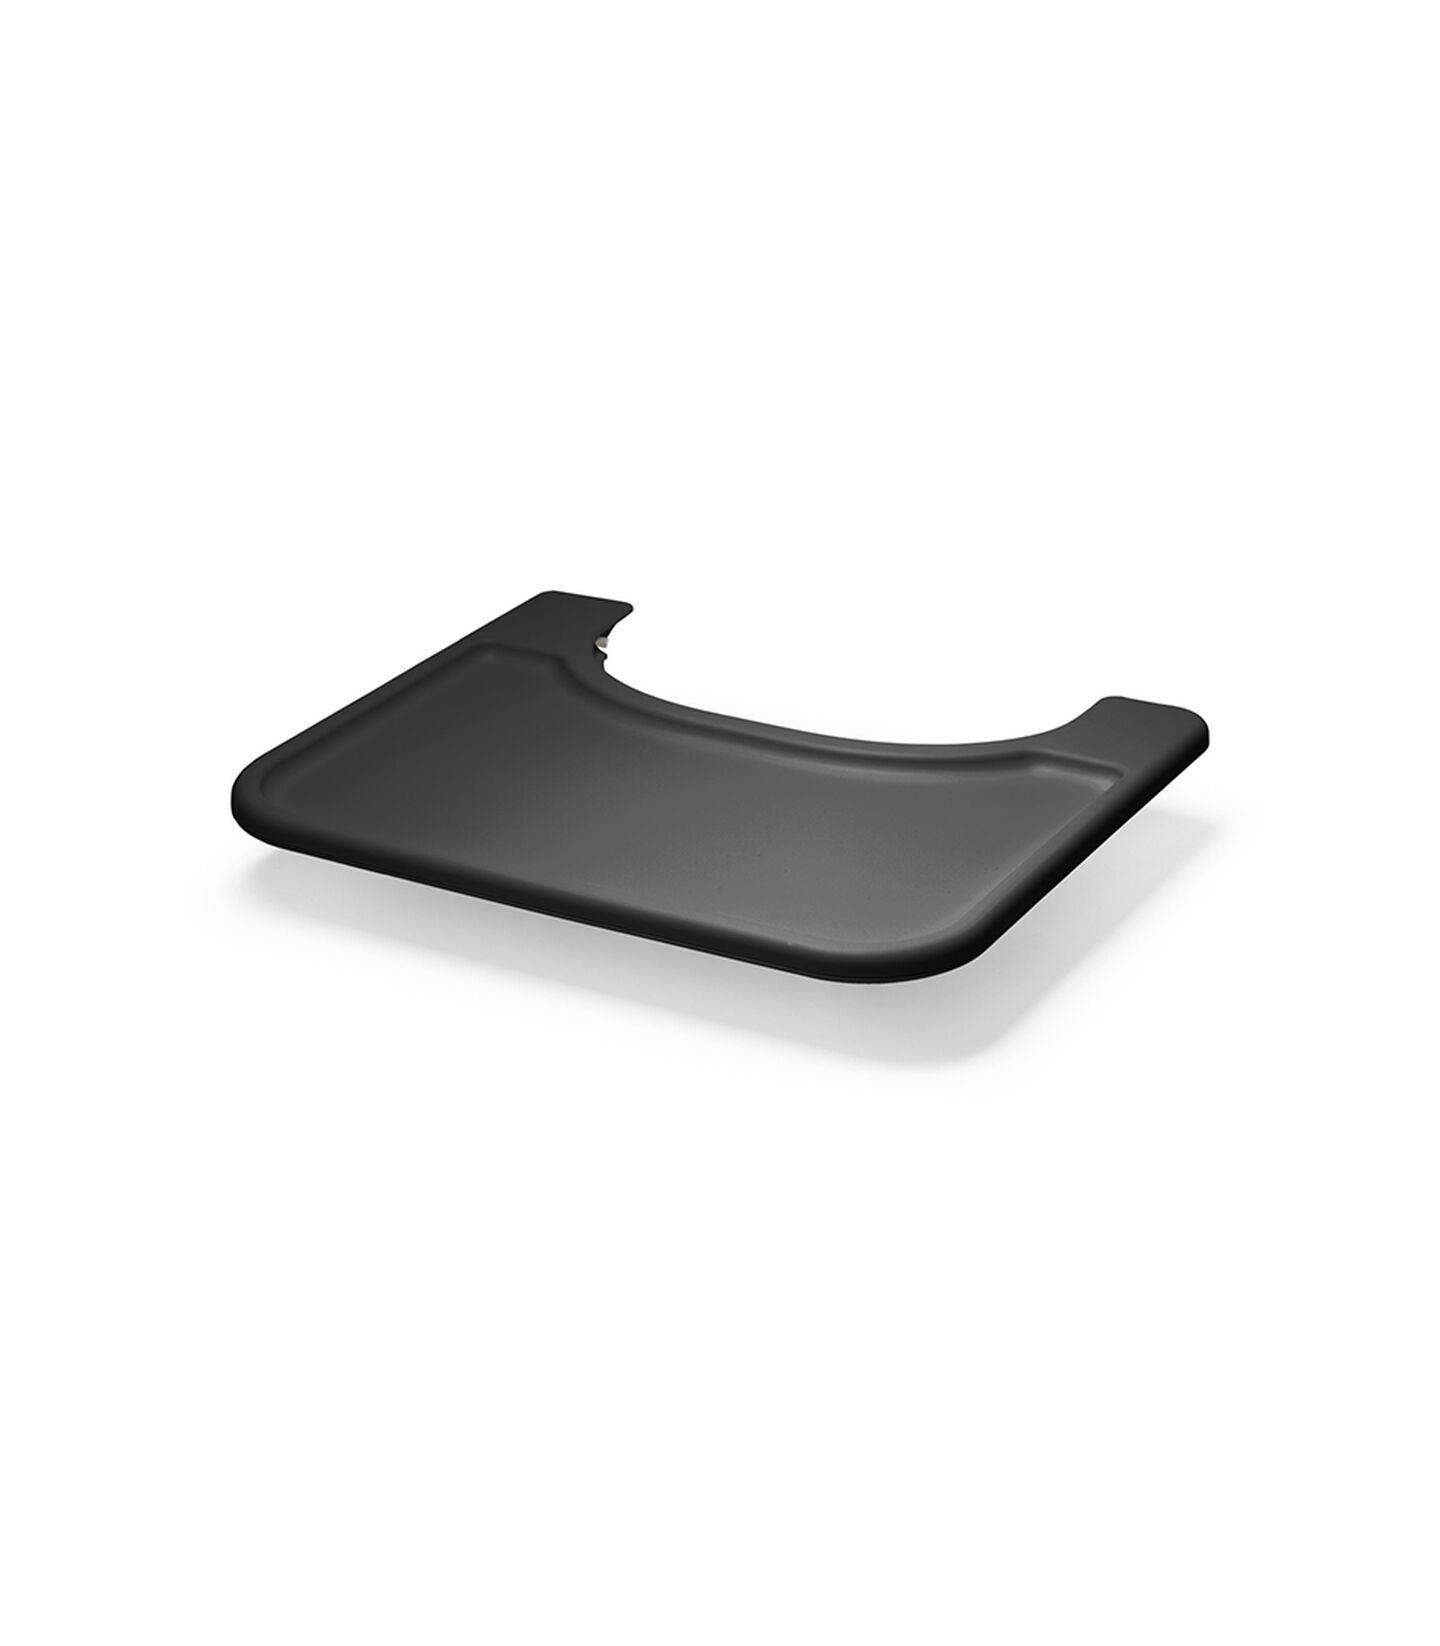 Stokke® Steps™ Baby Set Tray Black, Black, mainview view 2